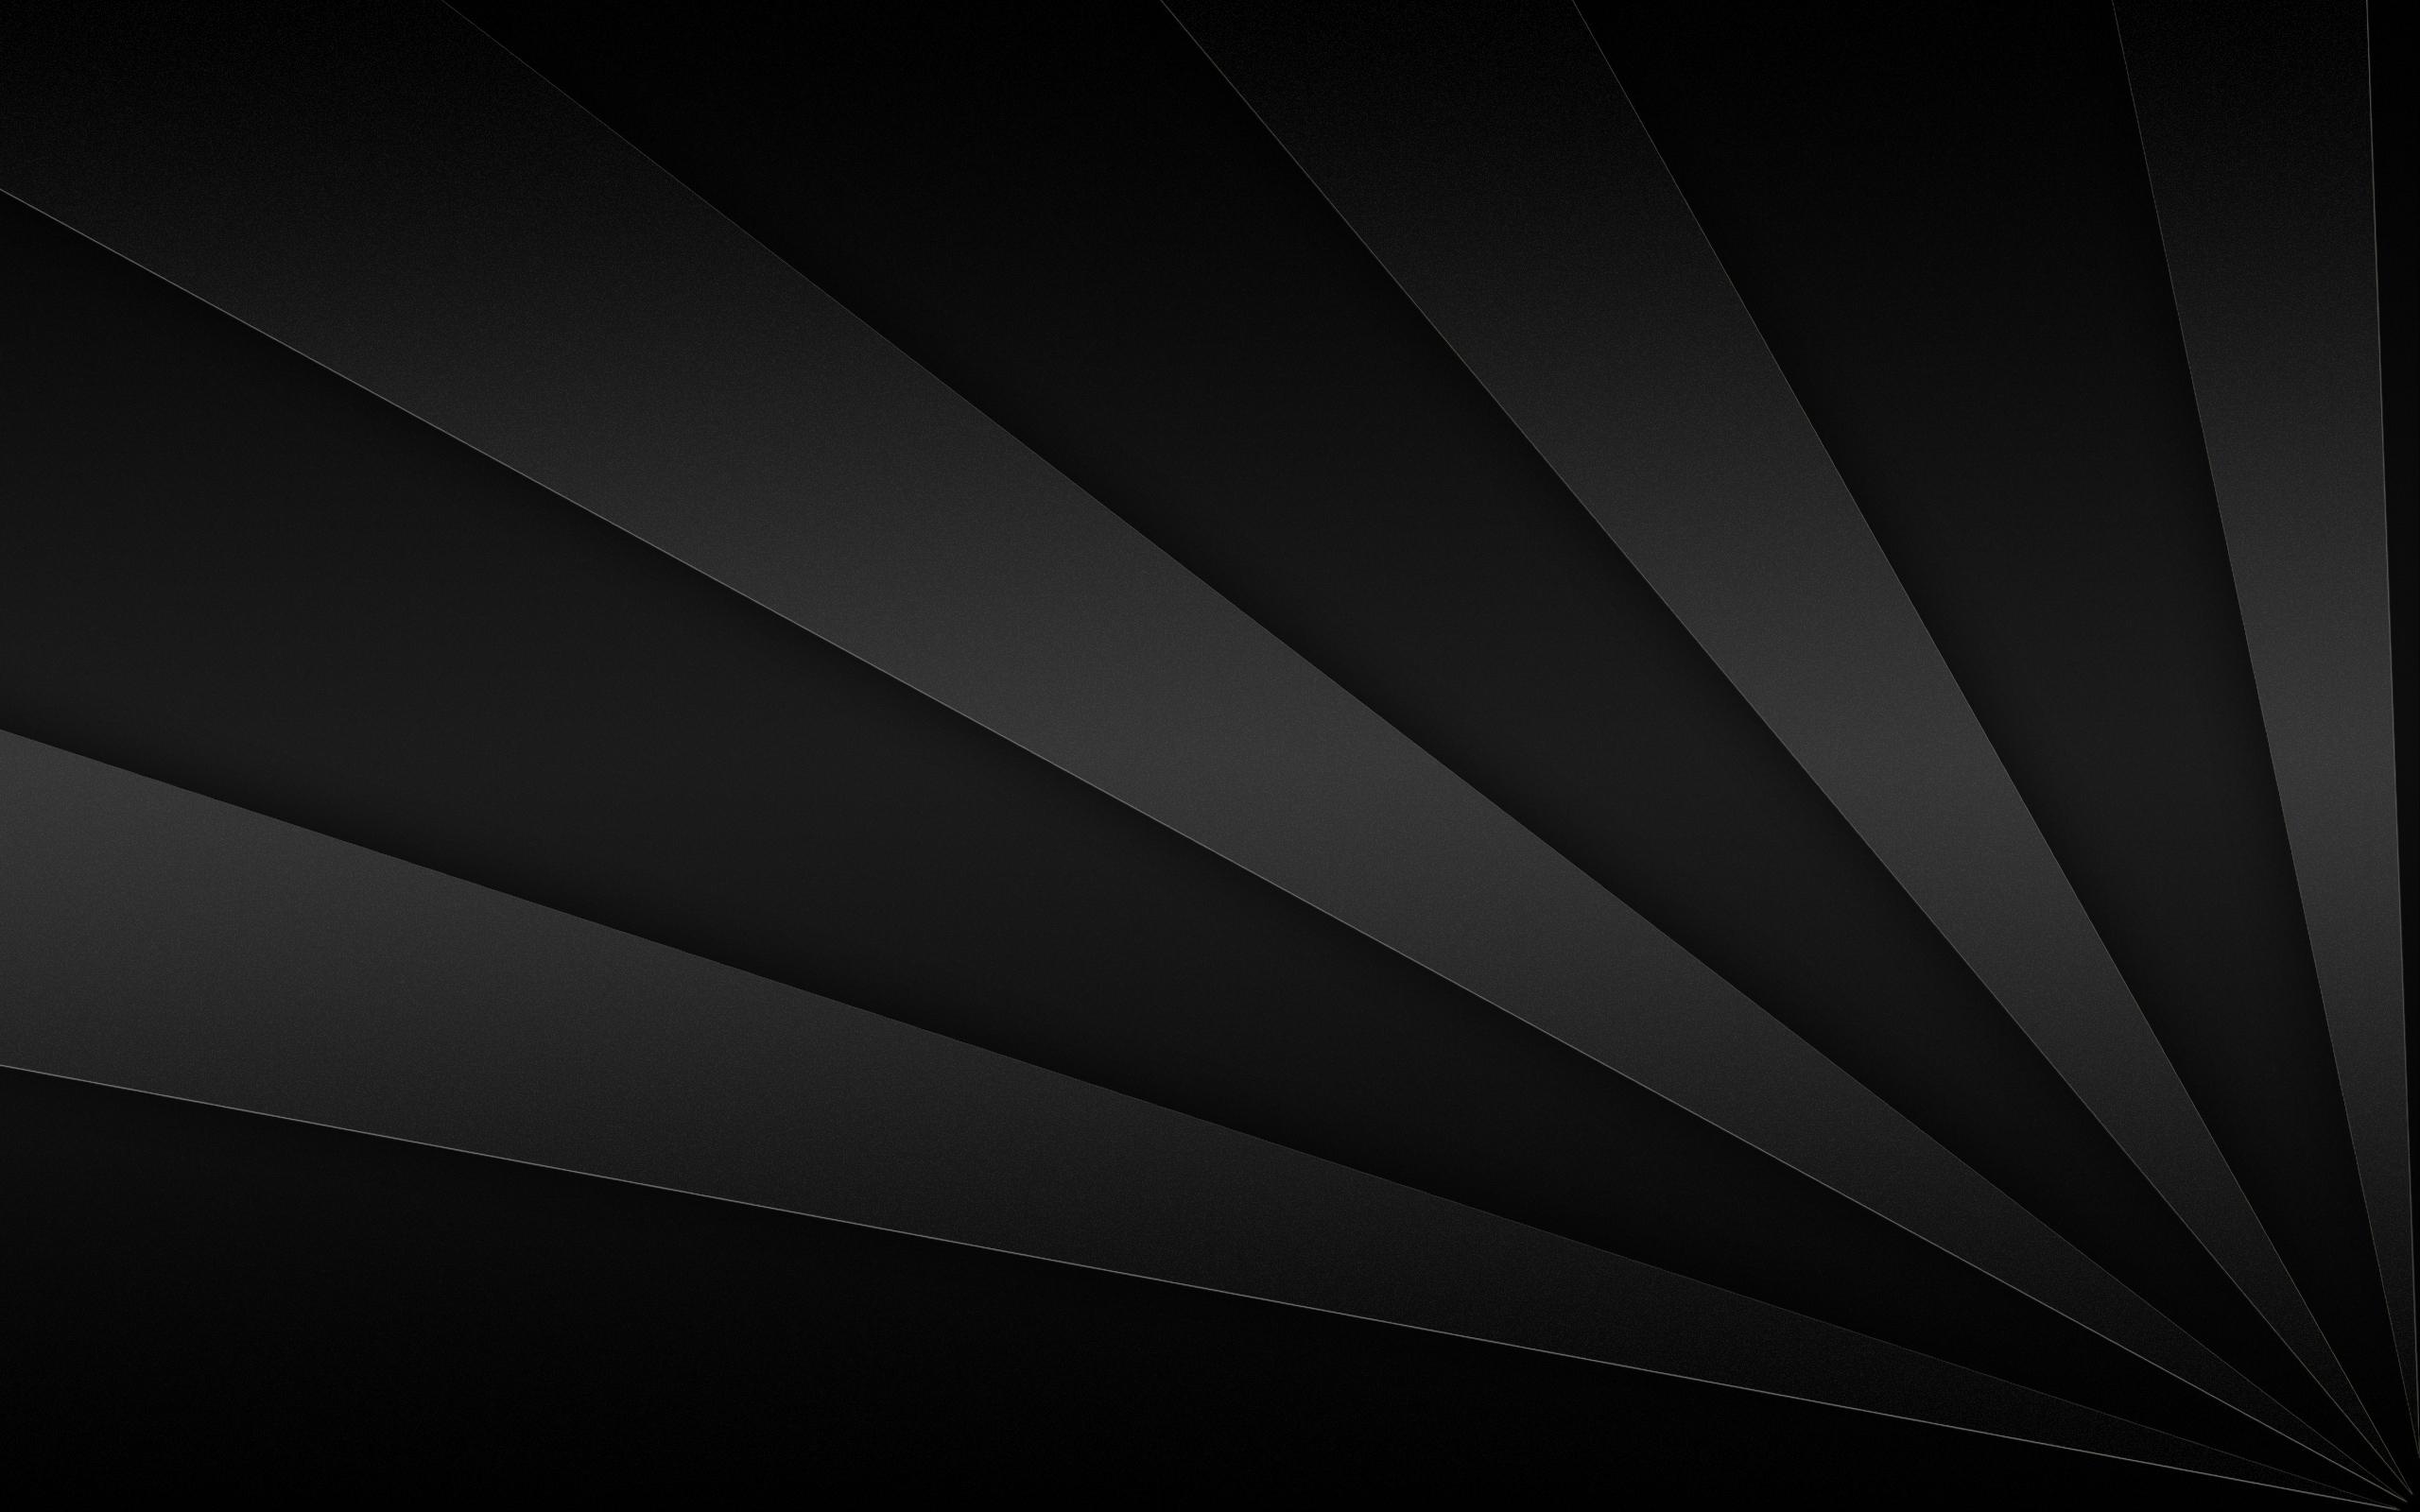 [Resim: lines_texture10915humi.jpg]